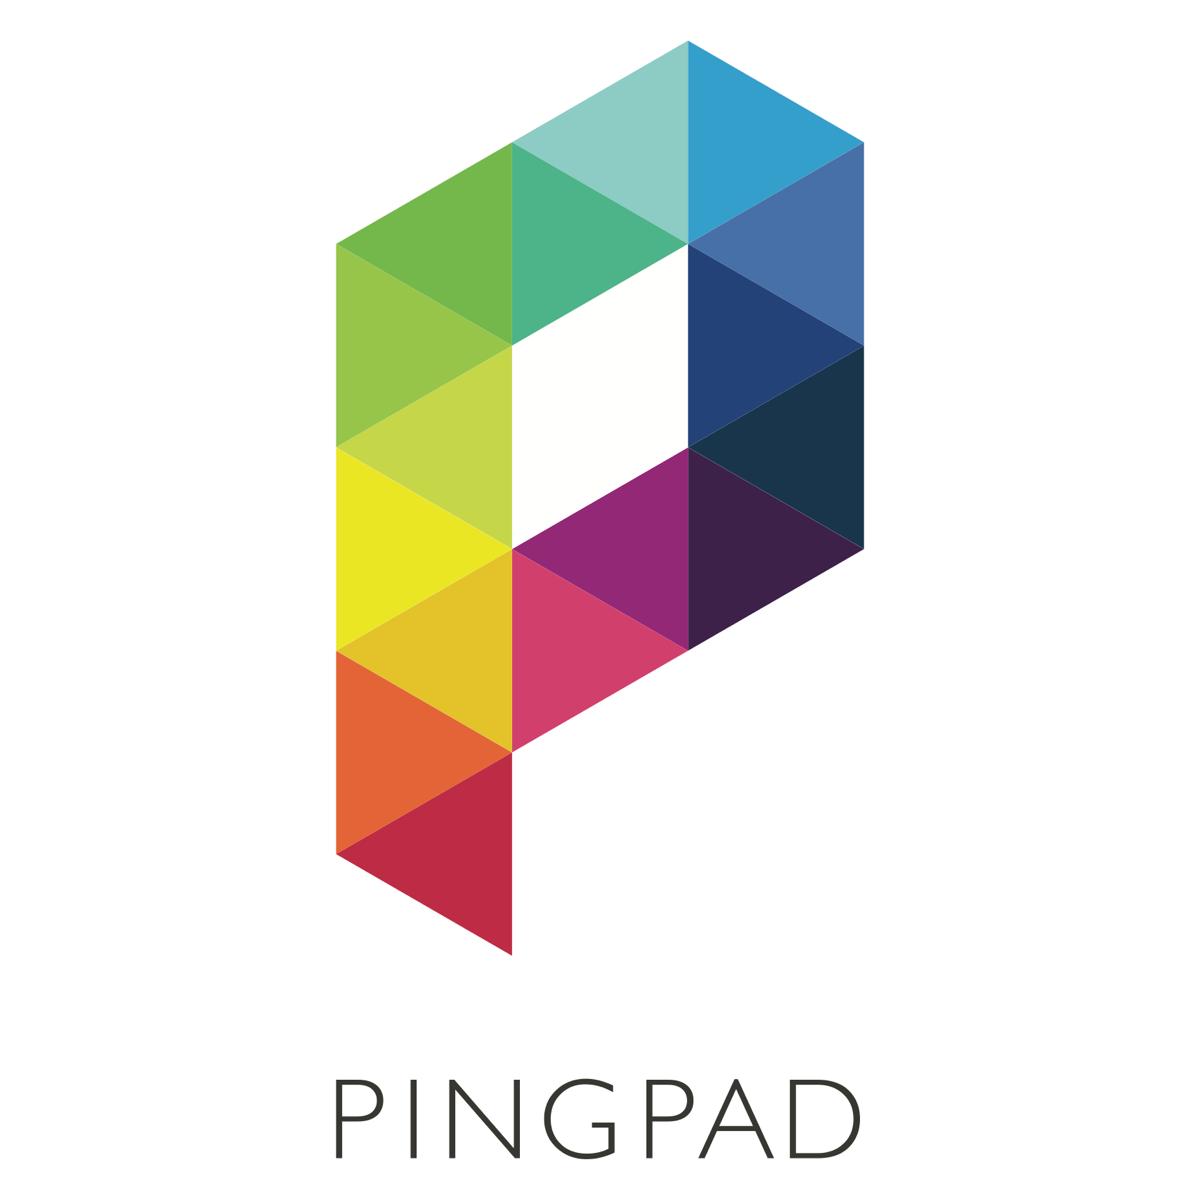 pingpad logo square.png